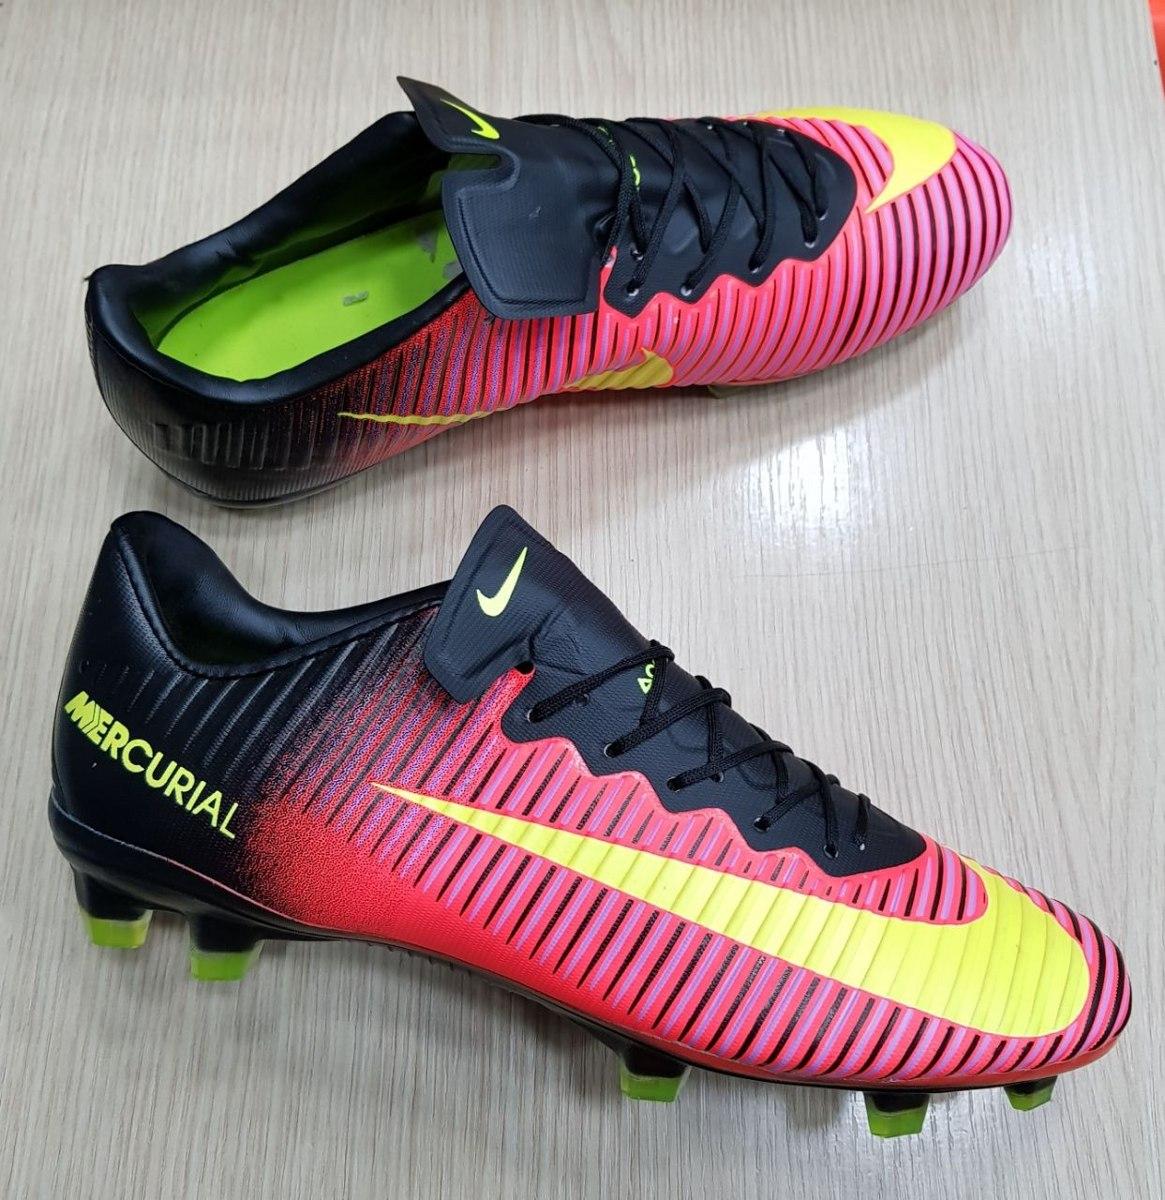 Guayos Nike Mercurial -   150.000 en Mercado Libre 90b06a6939fe7